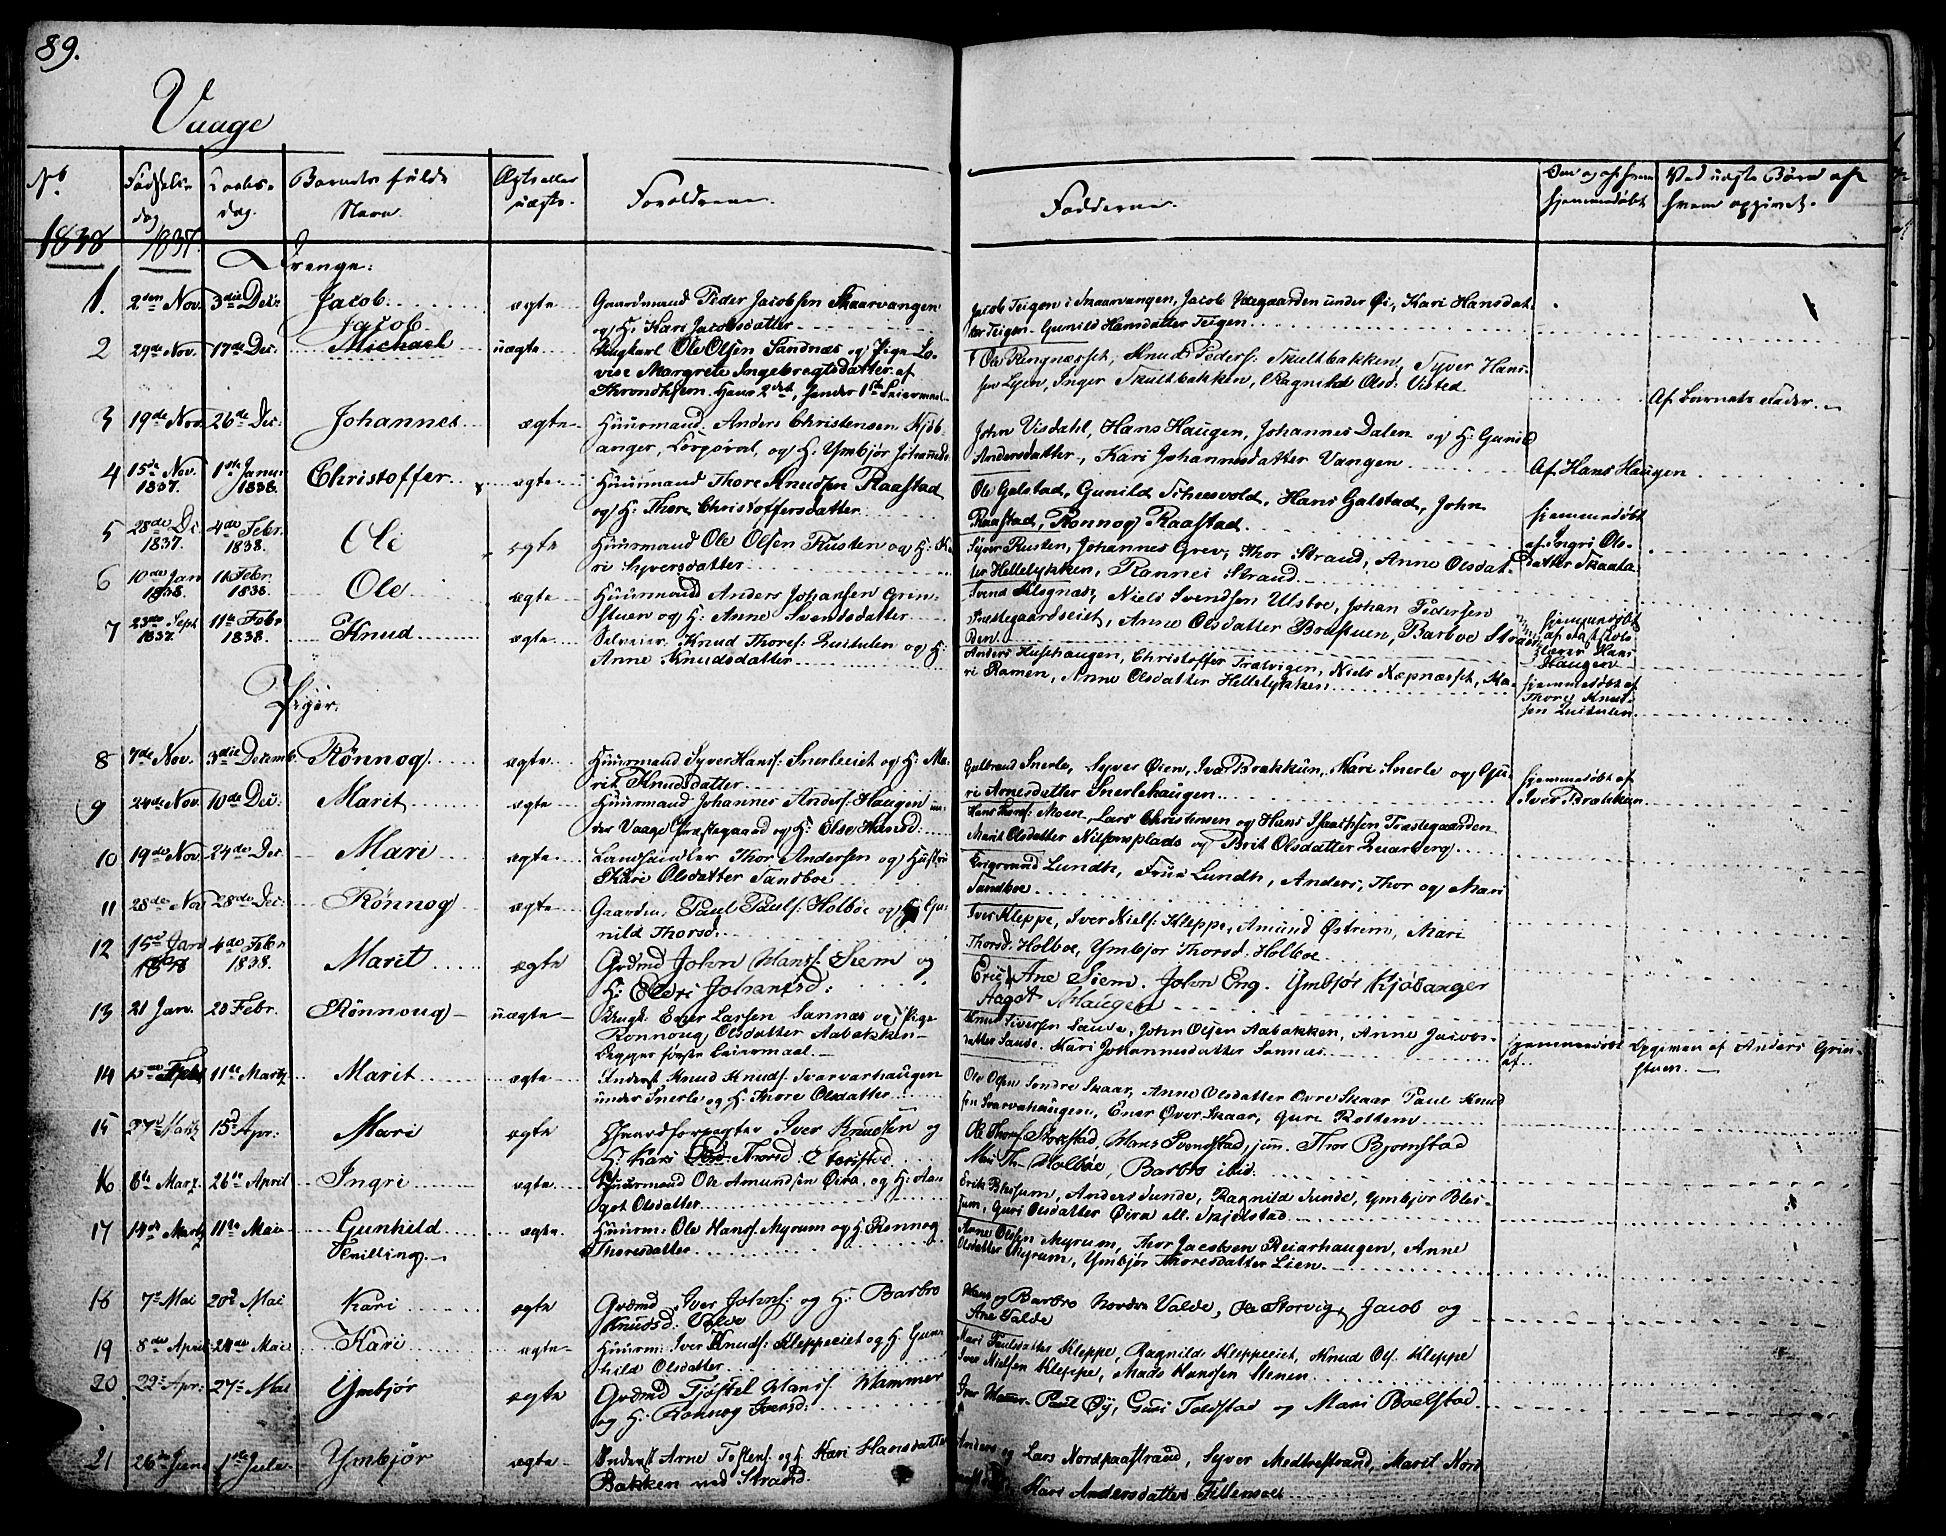 SAH, Vågå prestekontor, Ministerialbok nr. 4 /1, 1827-1842, s. 89